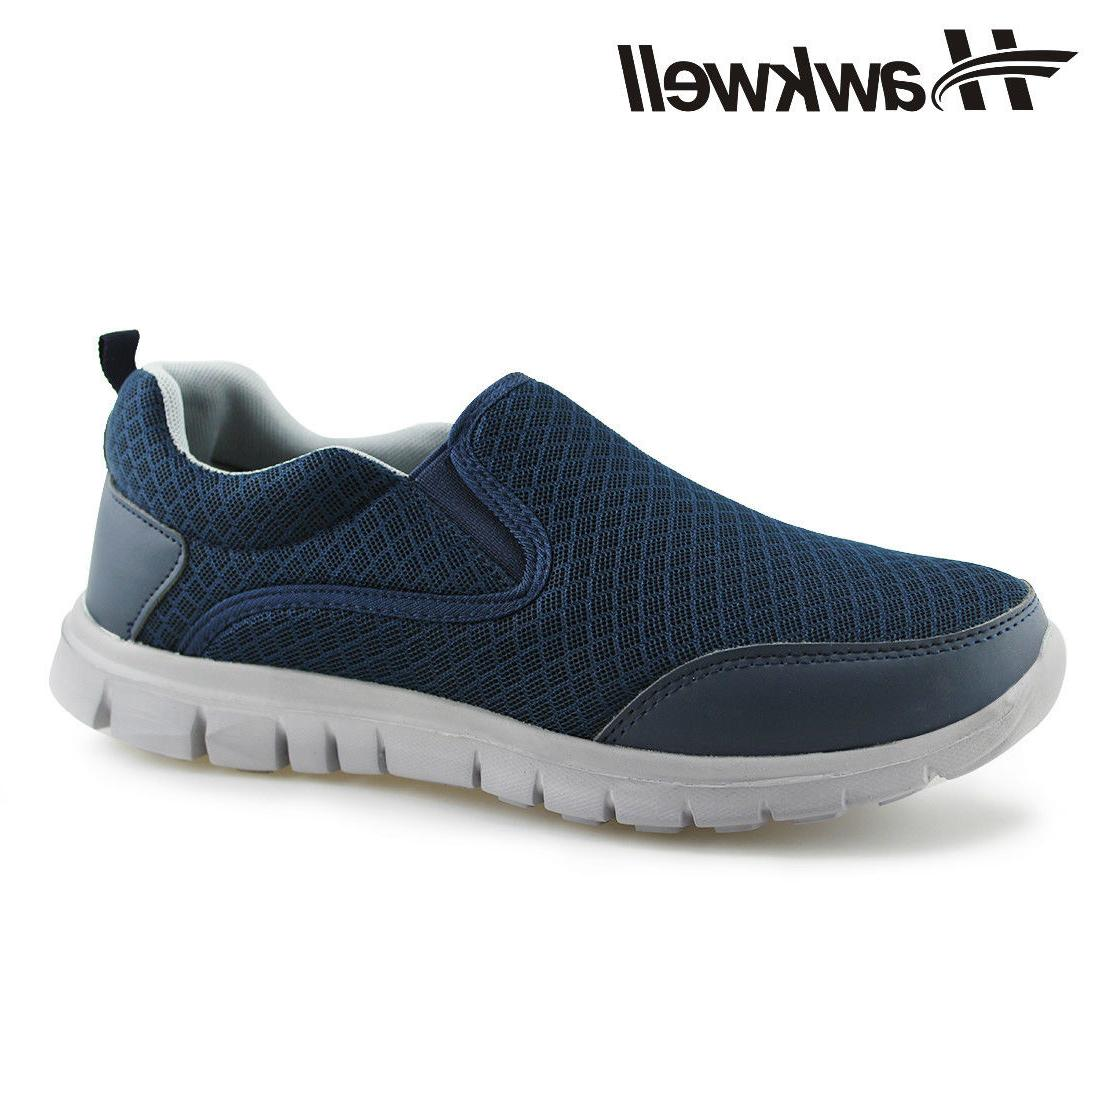 Men's Casual Shoes Slip-On Comfort Mesh Sneakers